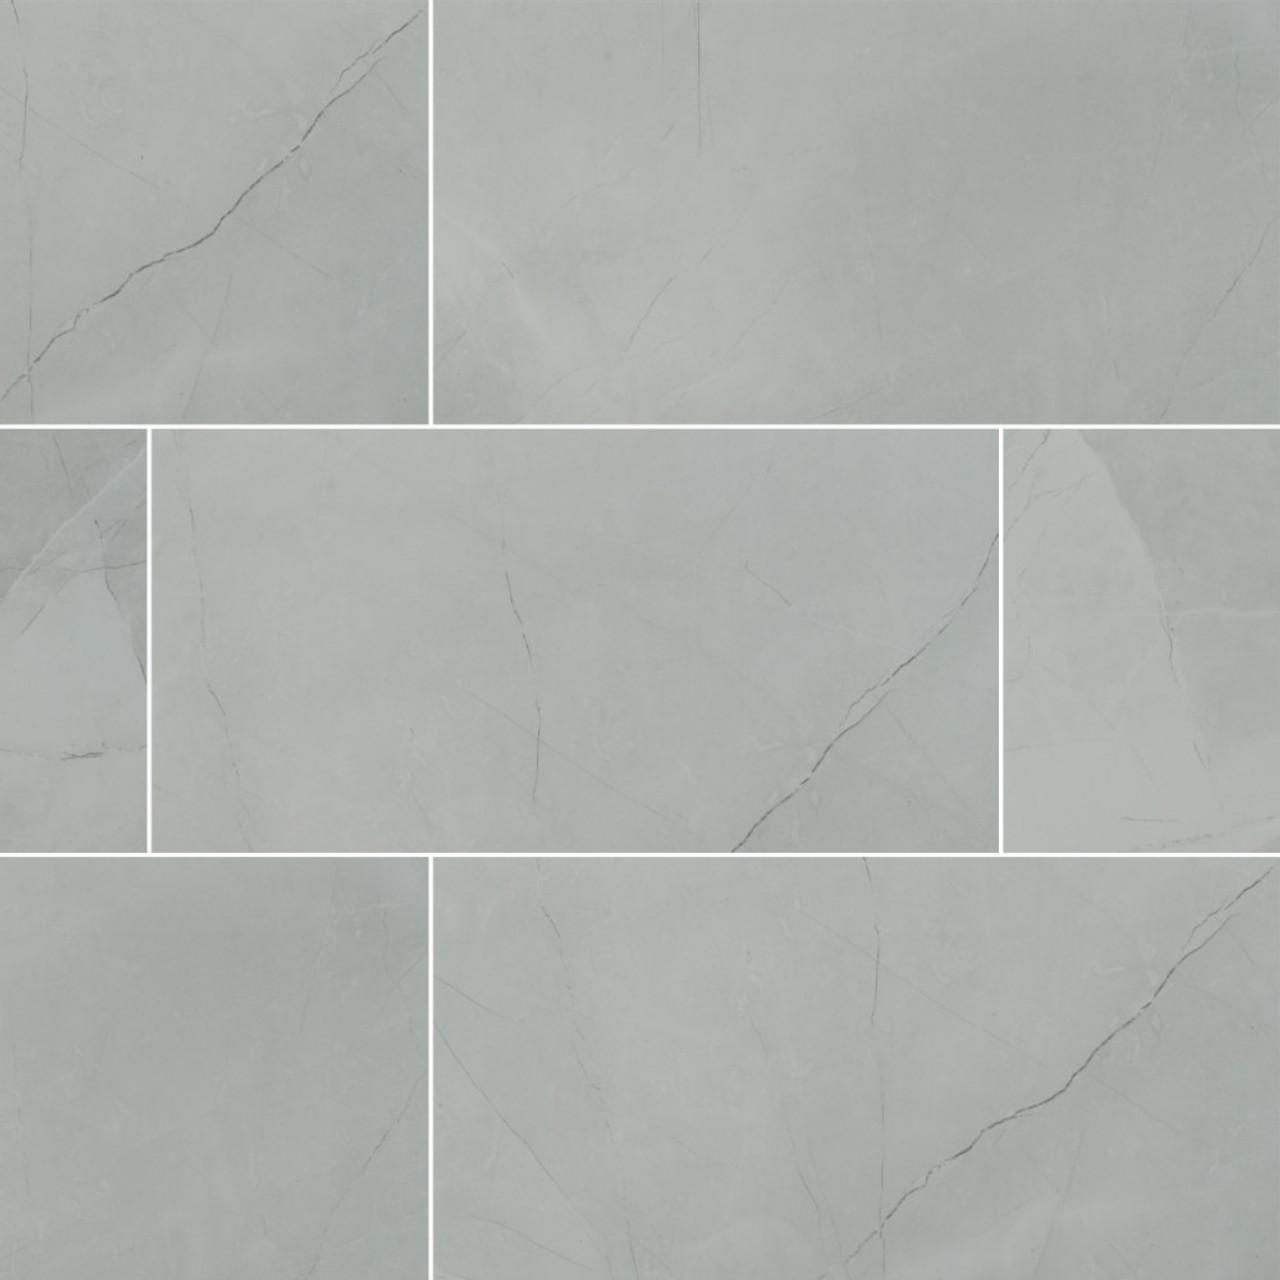 ms international sande series ivory 12x24 polished porcelain tile nsanivo1224p